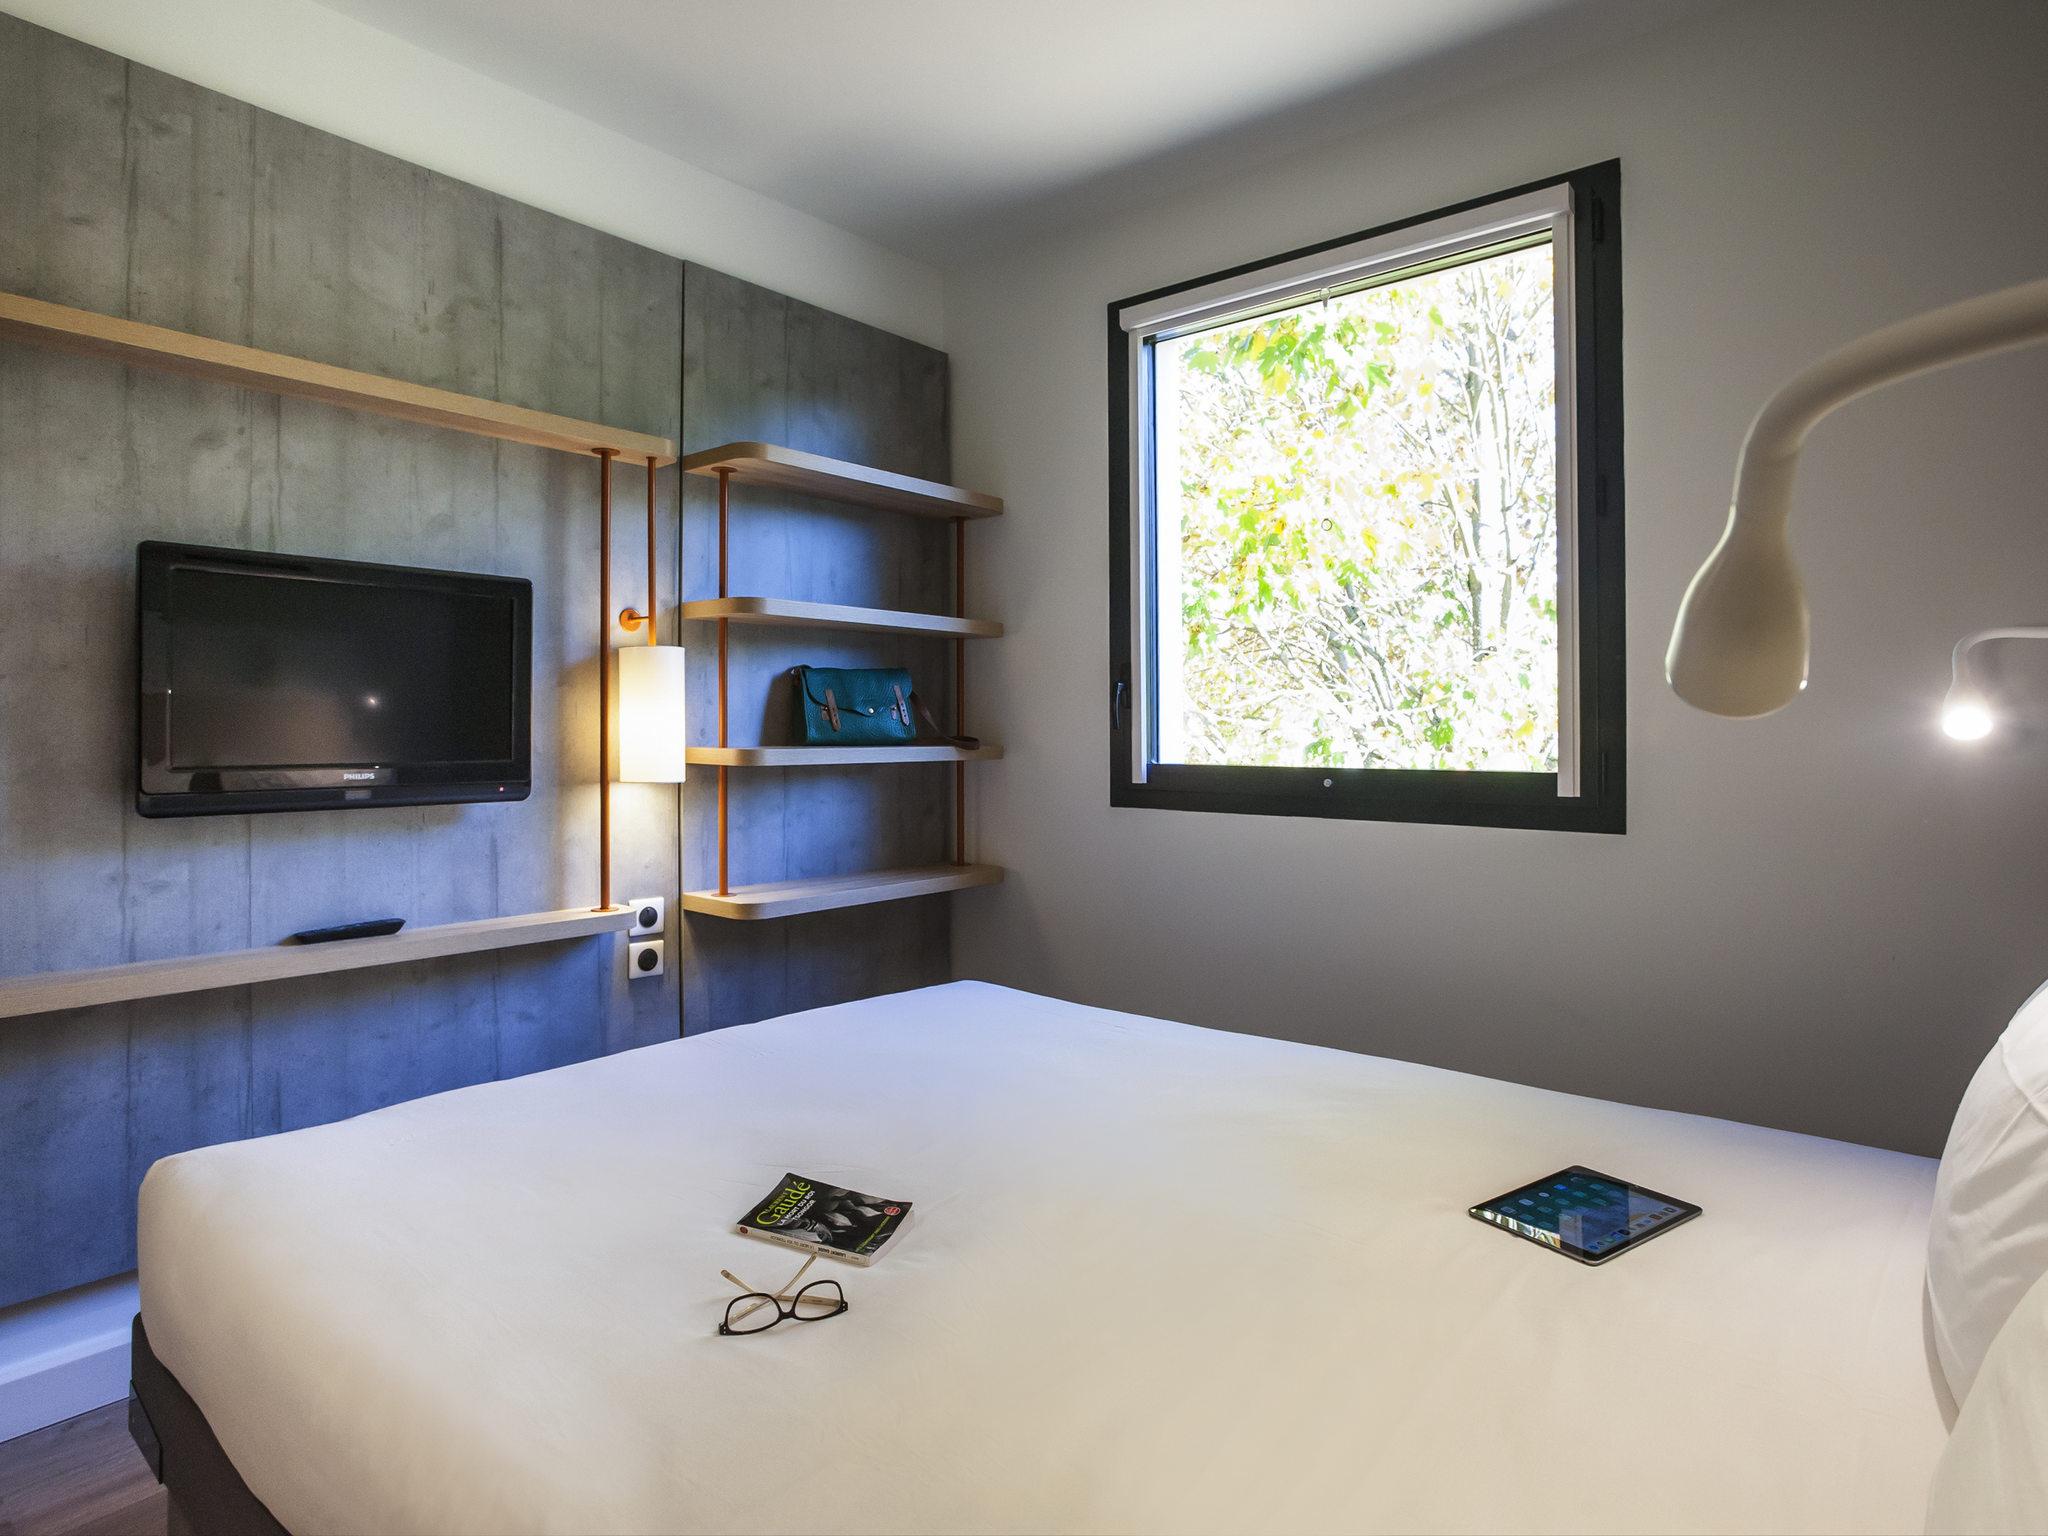 Hotel – ibis budget Château-Thierry (apertura en junio de 2018)